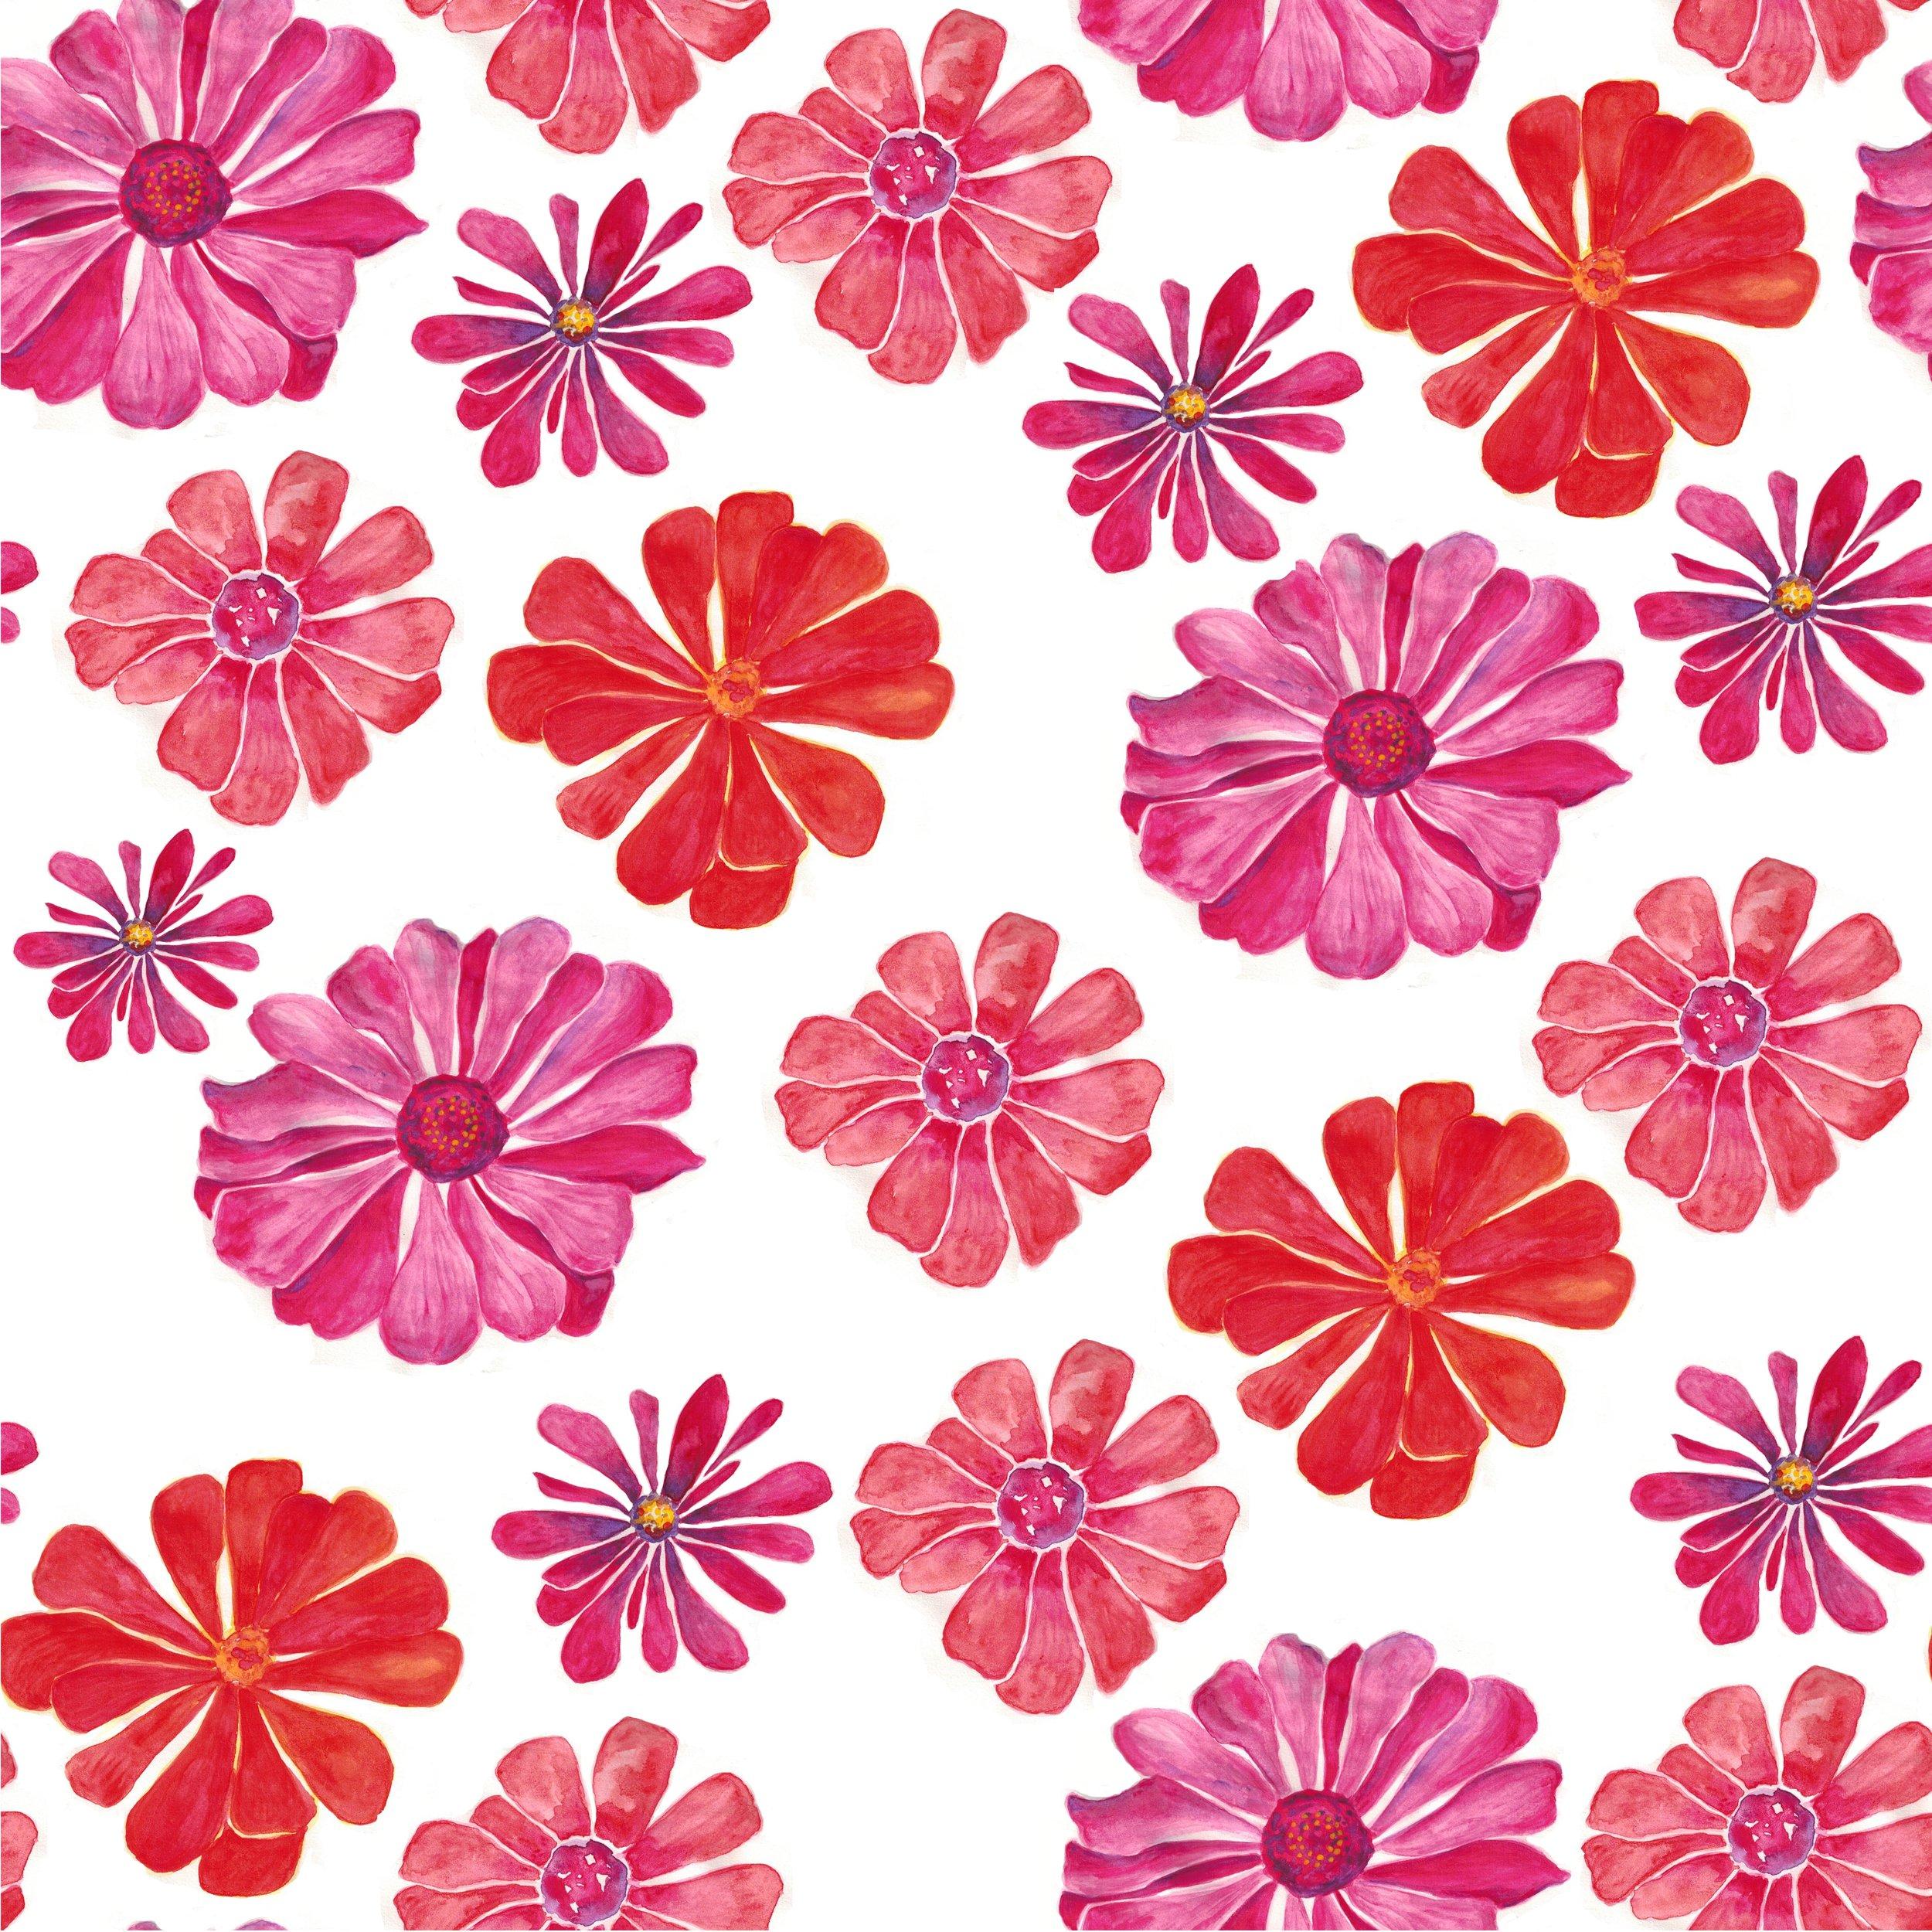 zinnia repeat pattern small.jpg